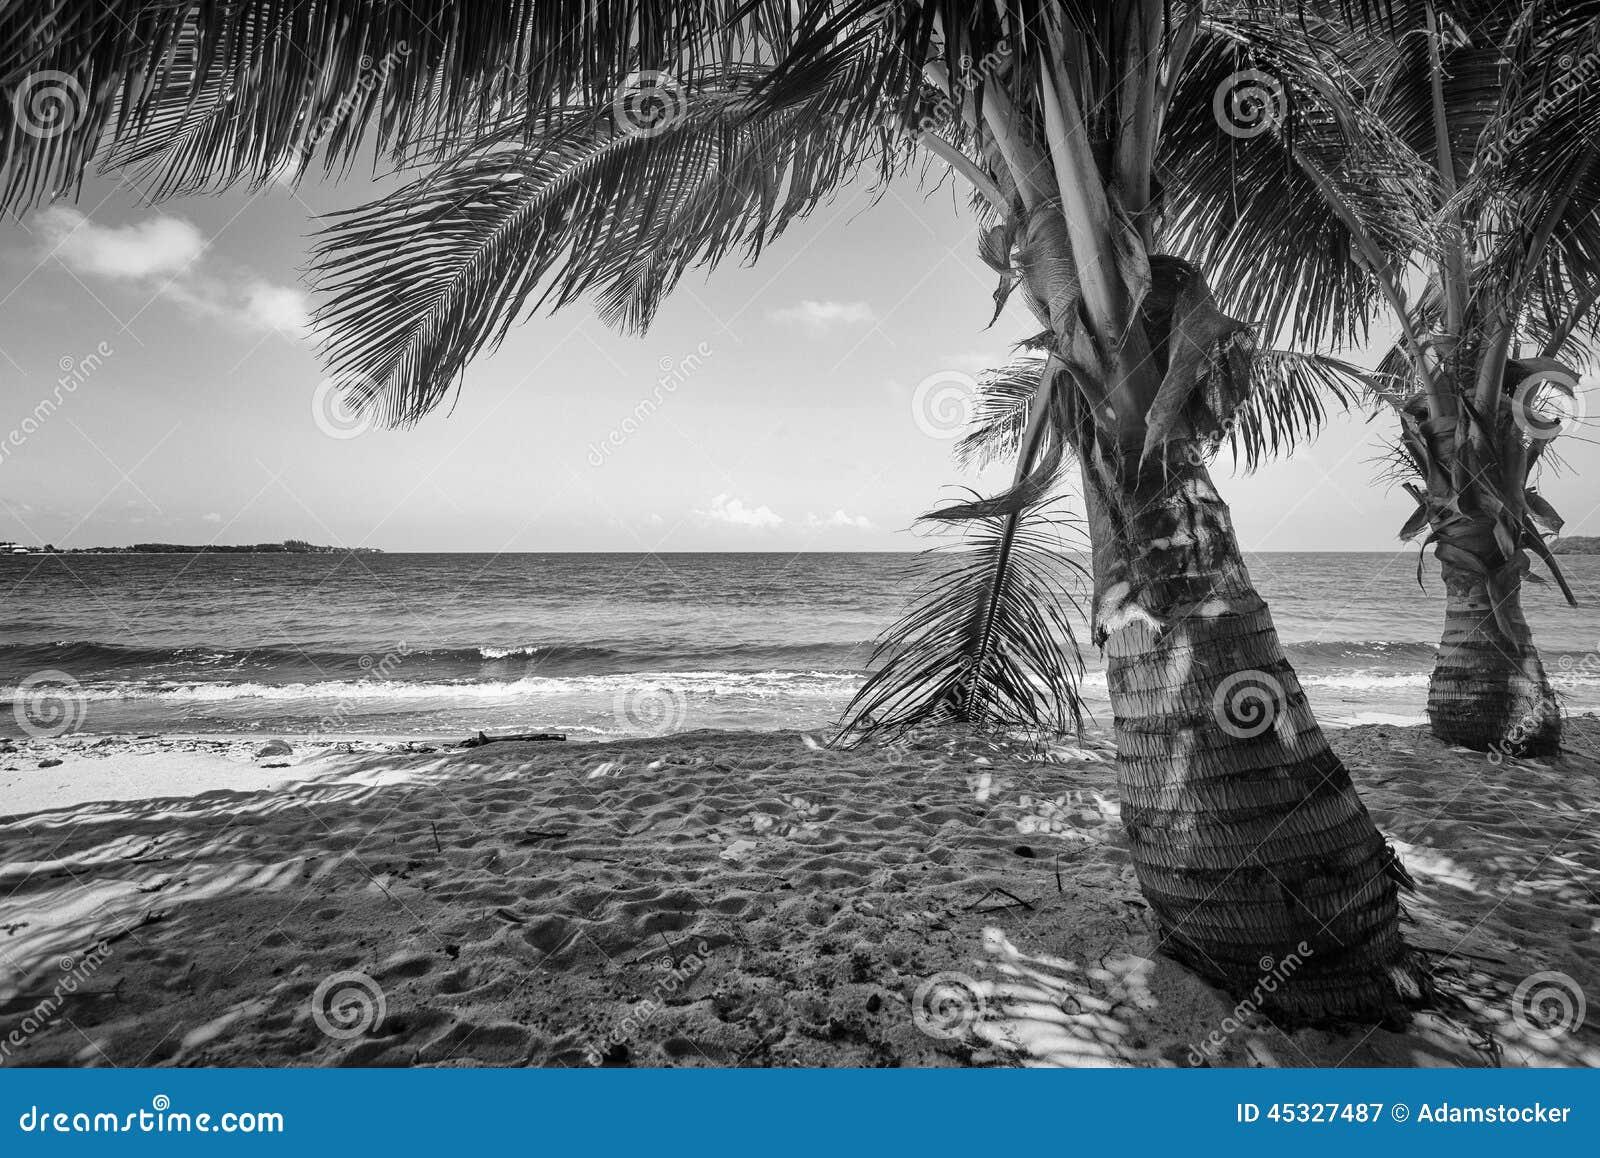 Zwart-wit Tropisch Strand Stock Foto - Afbeelding: 45327487